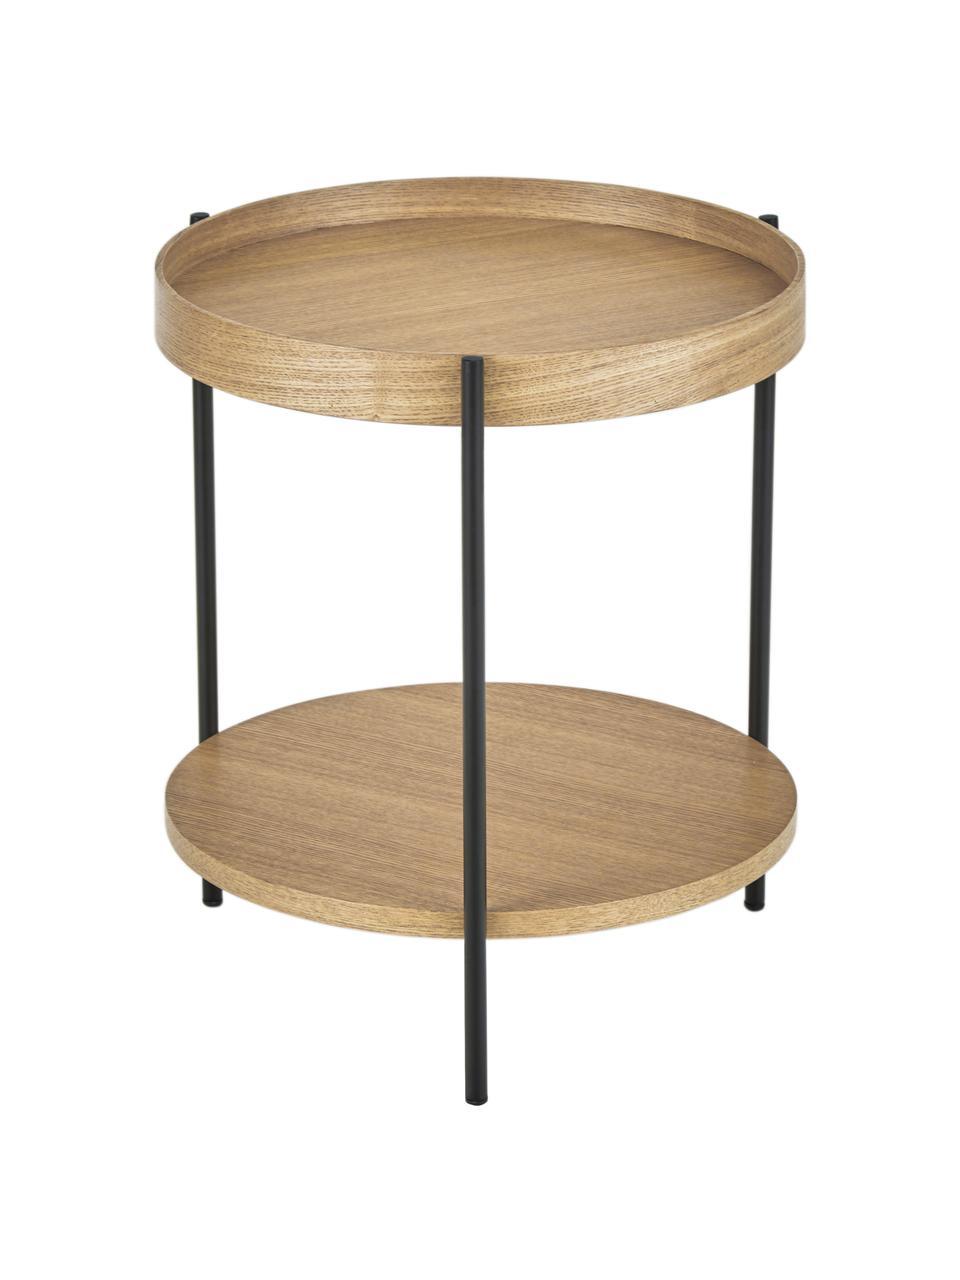 Holz-Beistelltisch Renee mit Eschenholzfurnier, Gestell: Metall, pulverbeschichtet, Eschenholz, Ø 44 x H 49 cm